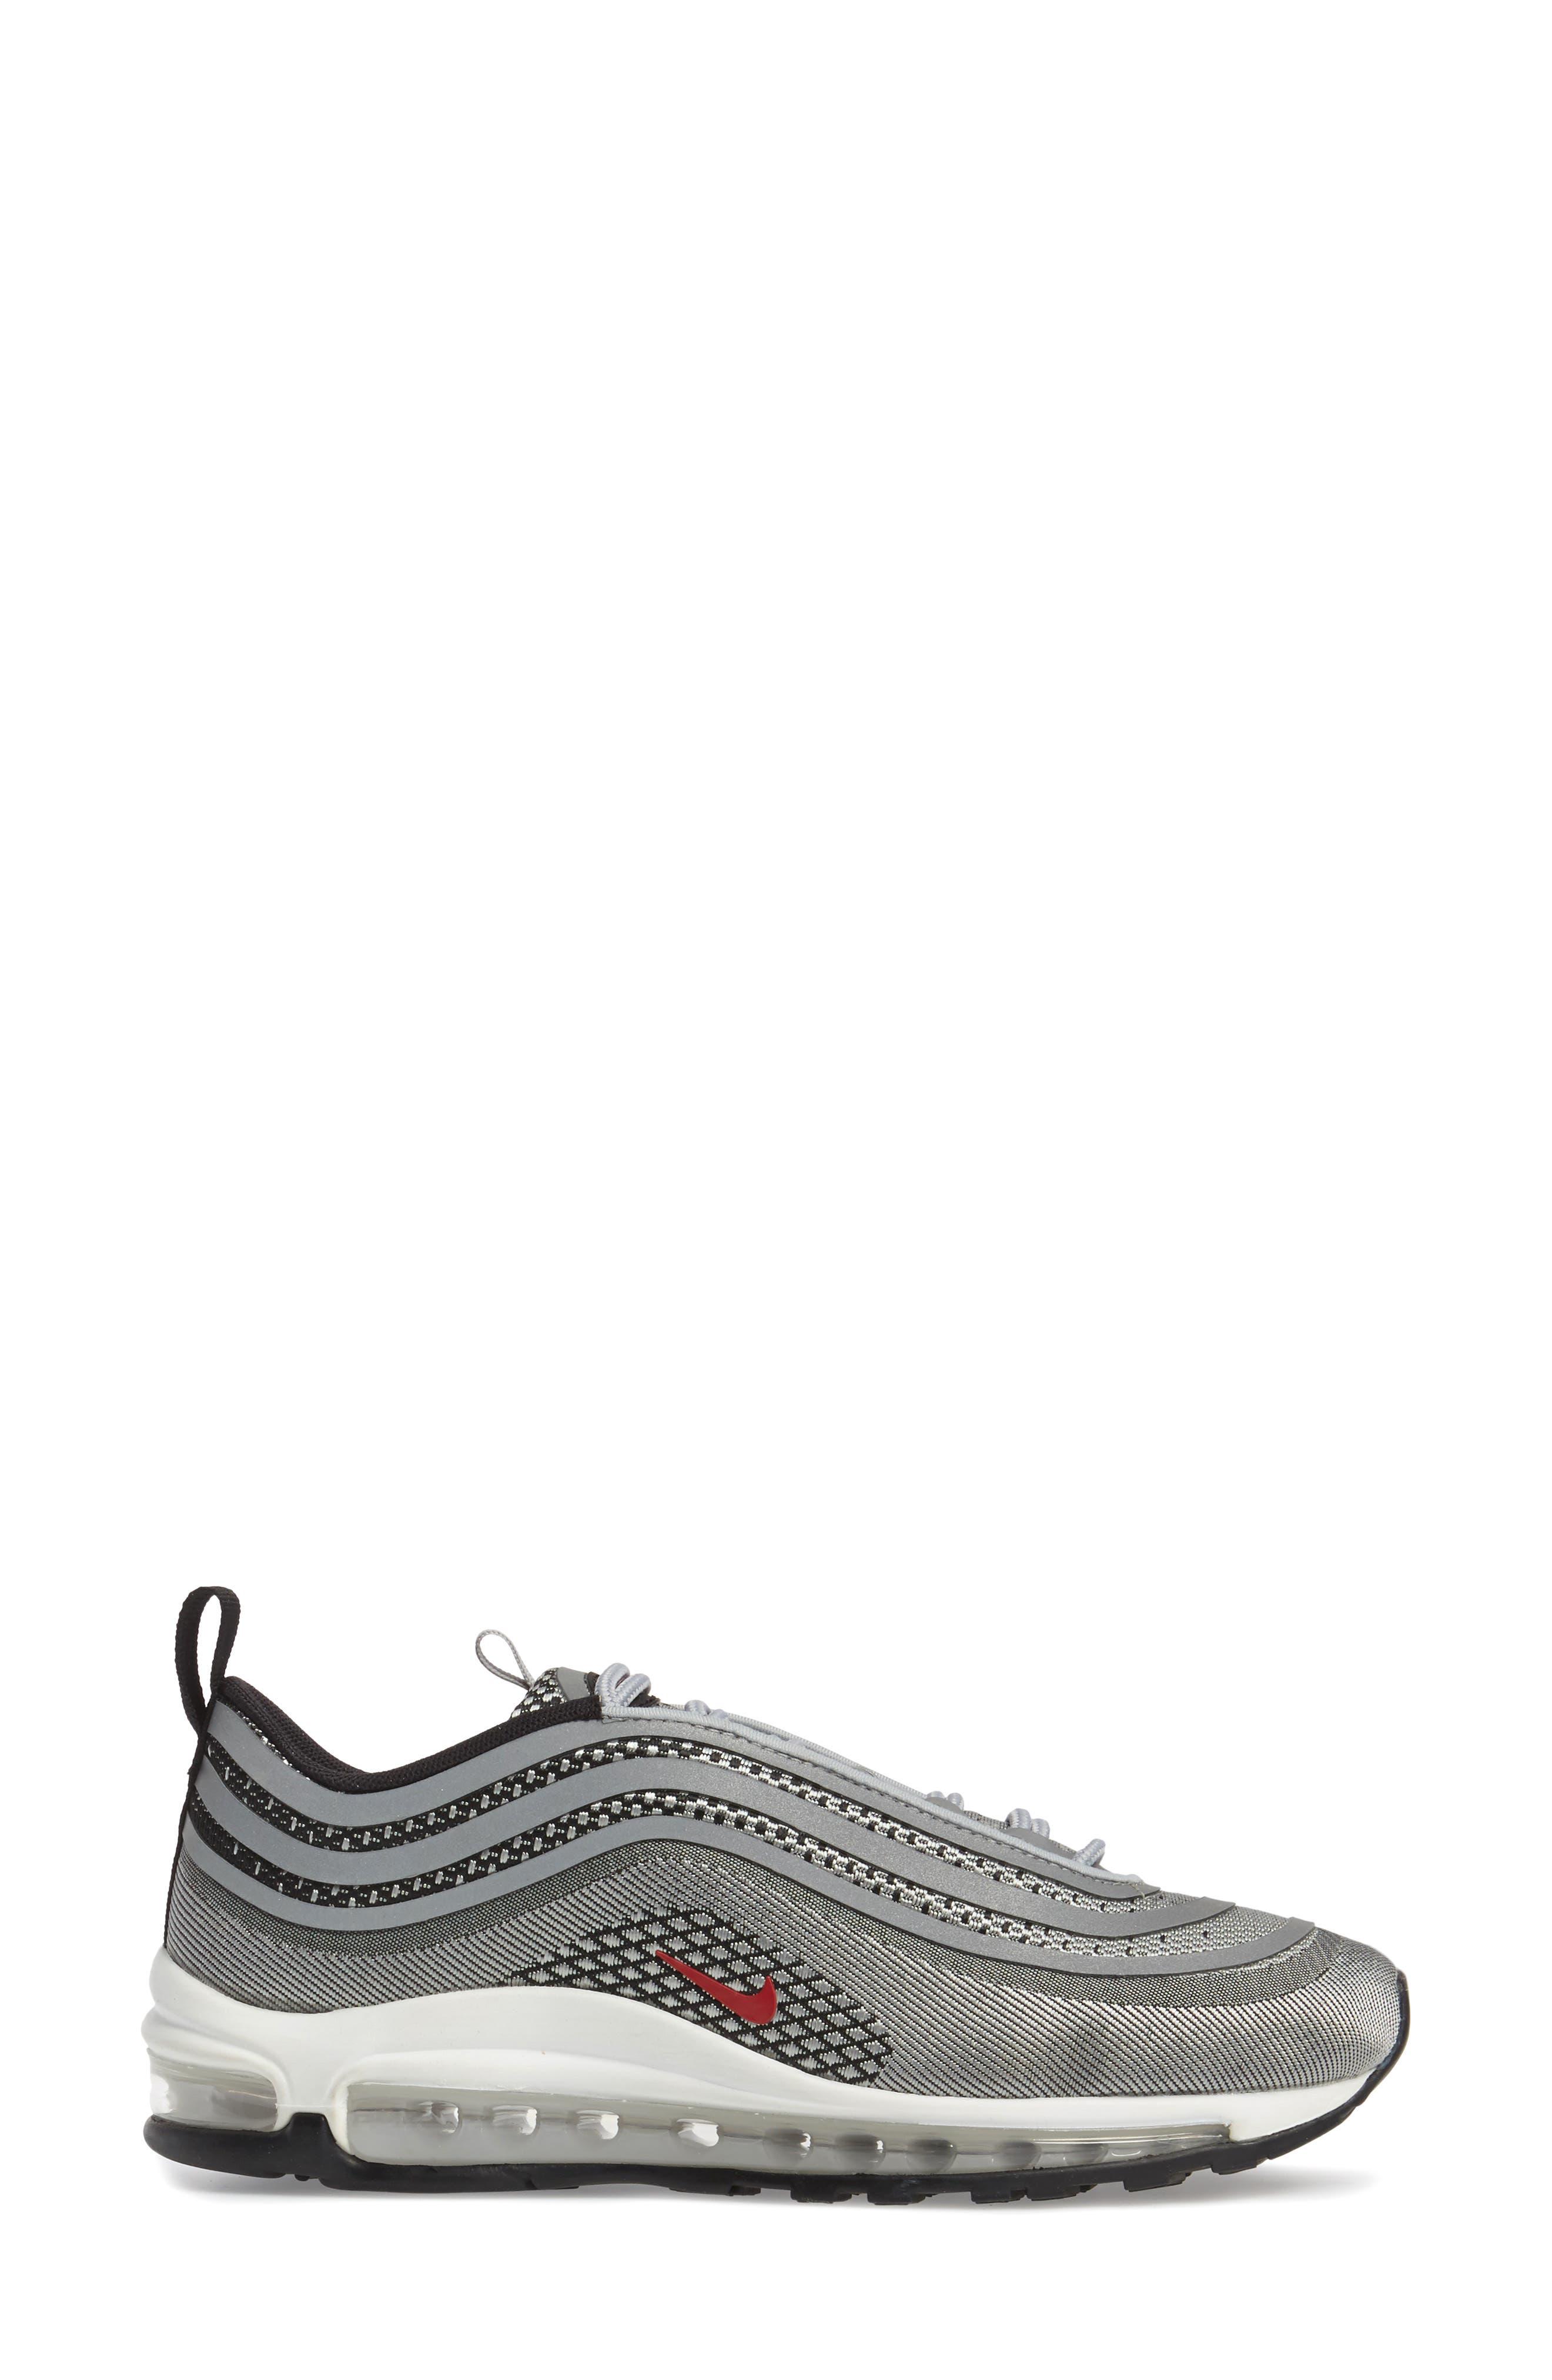 Air Max 97 Ultralight 2017 Sneaker,                             Alternate thumbnail 27, color,